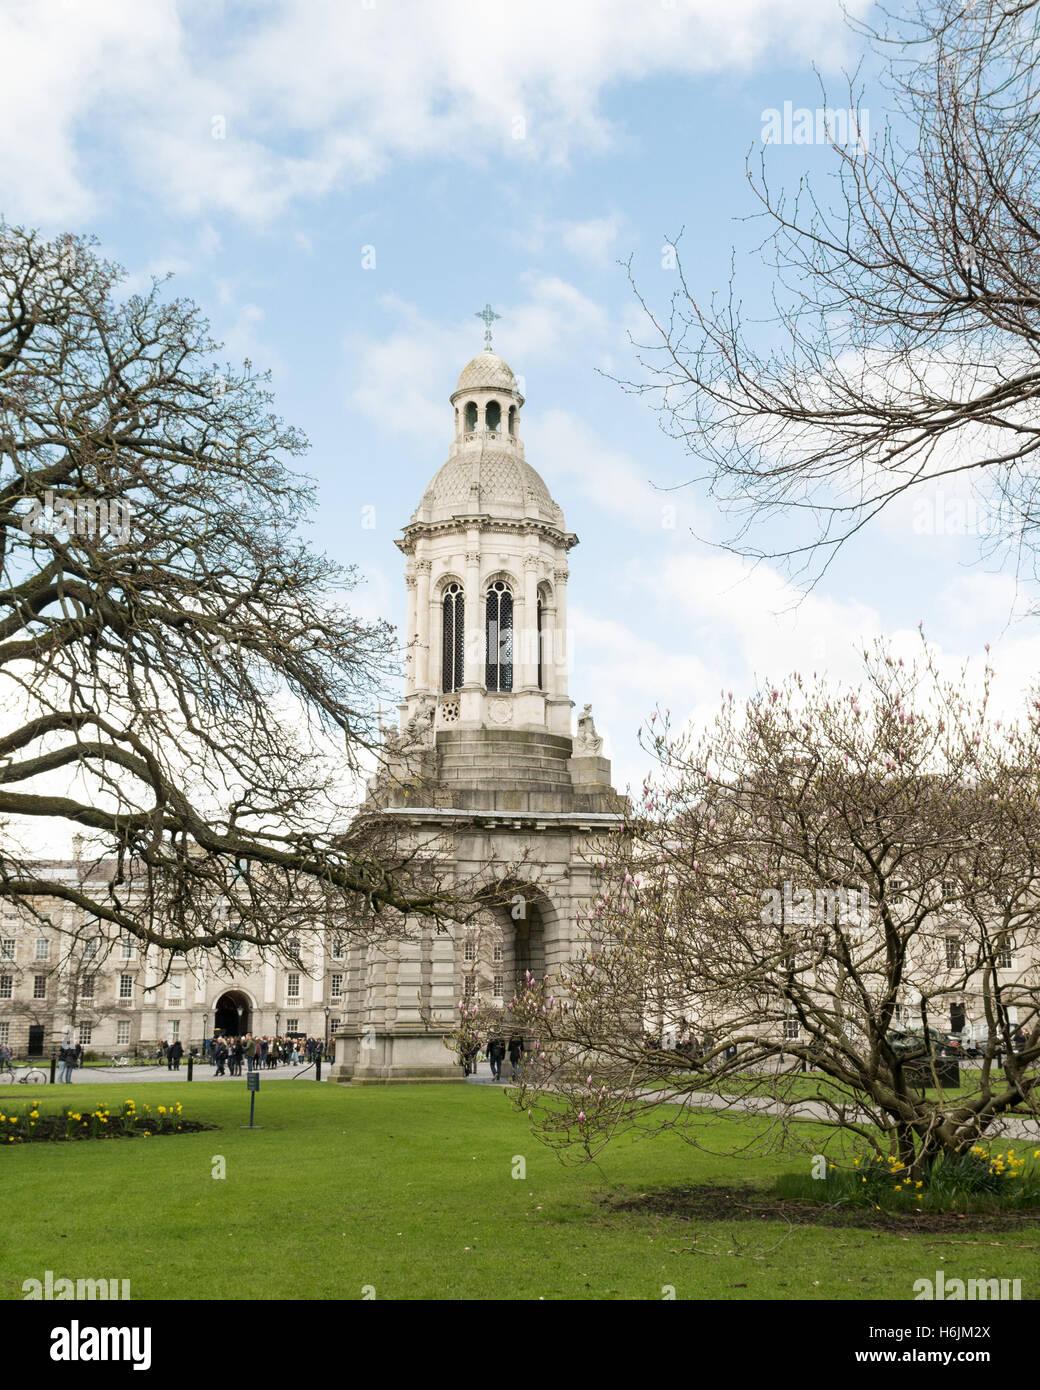 Trinity College Dublin - campanile belltower - Dublin, Ireland - Stock Image